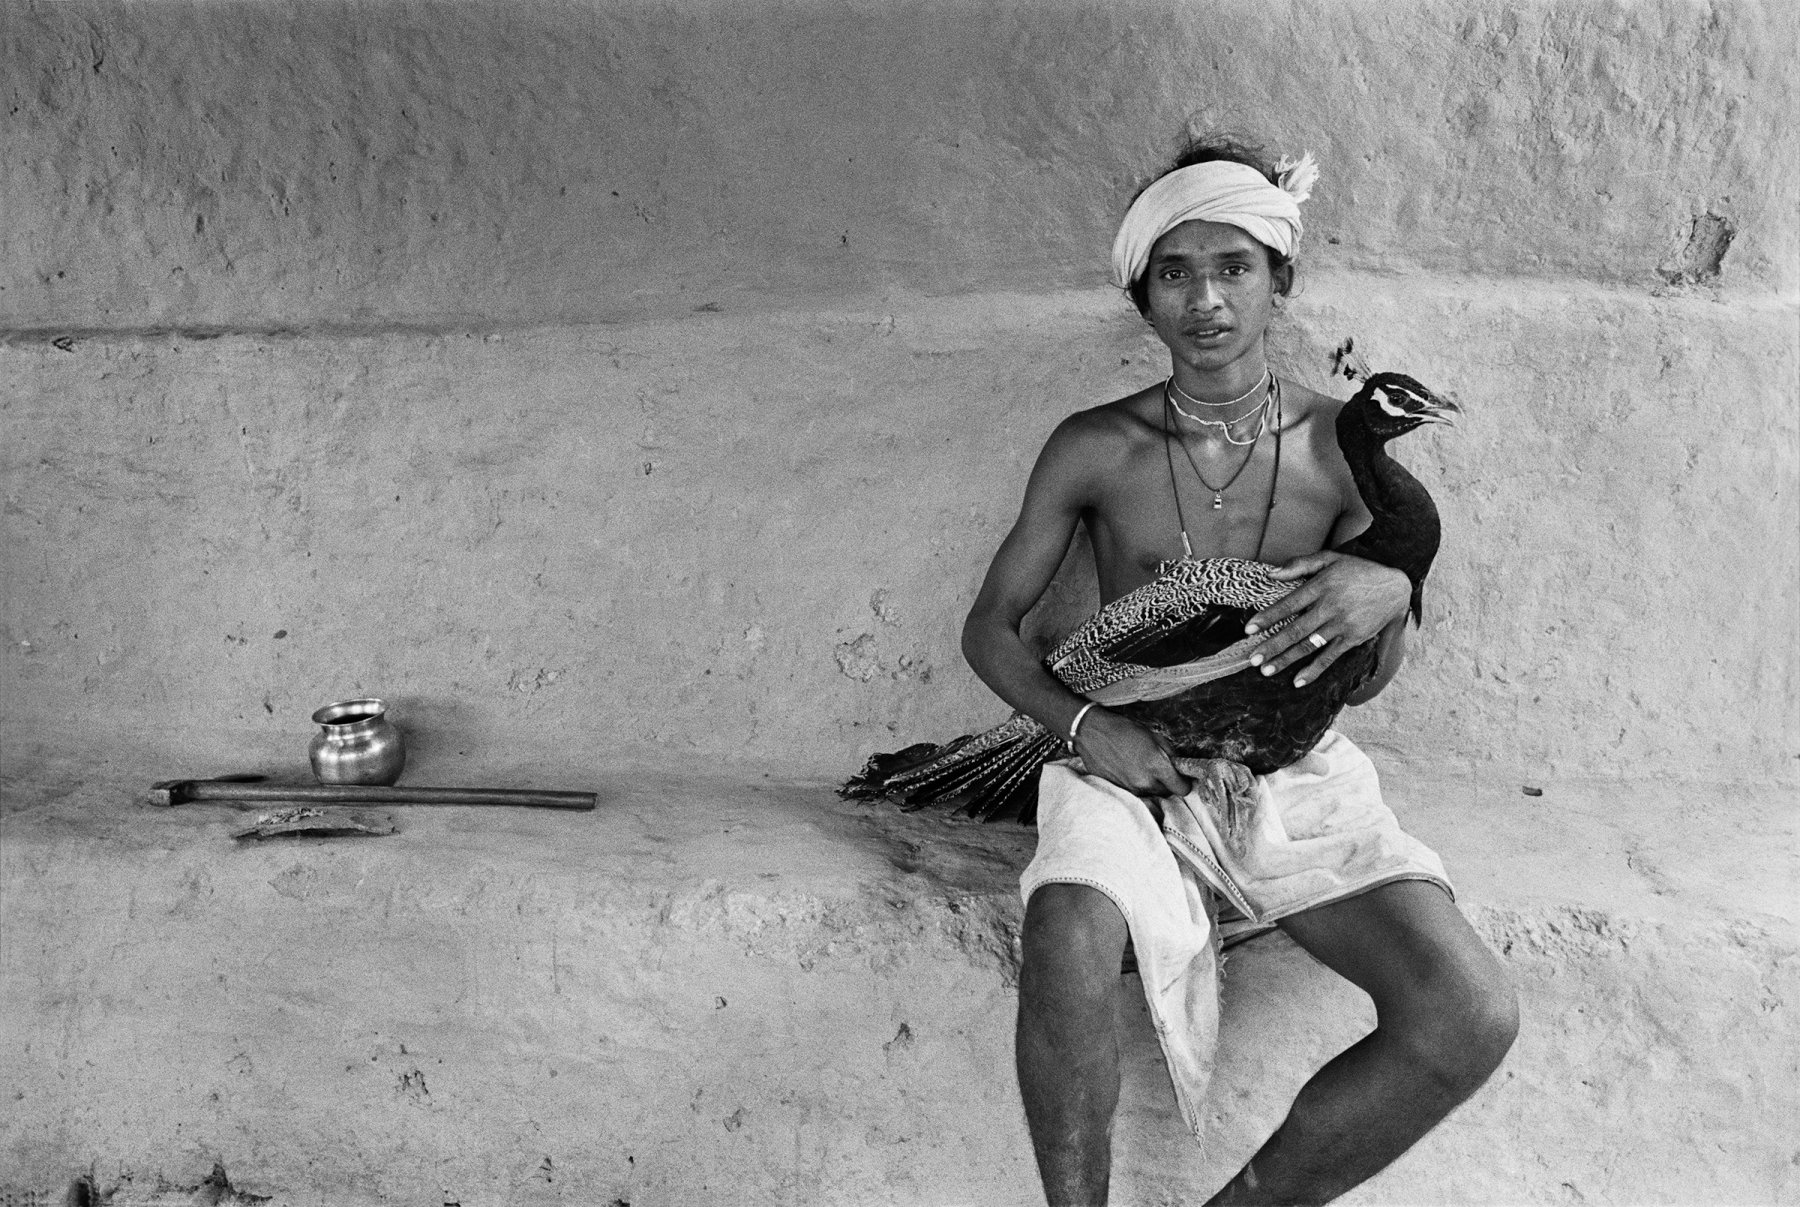 Boy with Peacock, Village Pulcha, Bastar, India